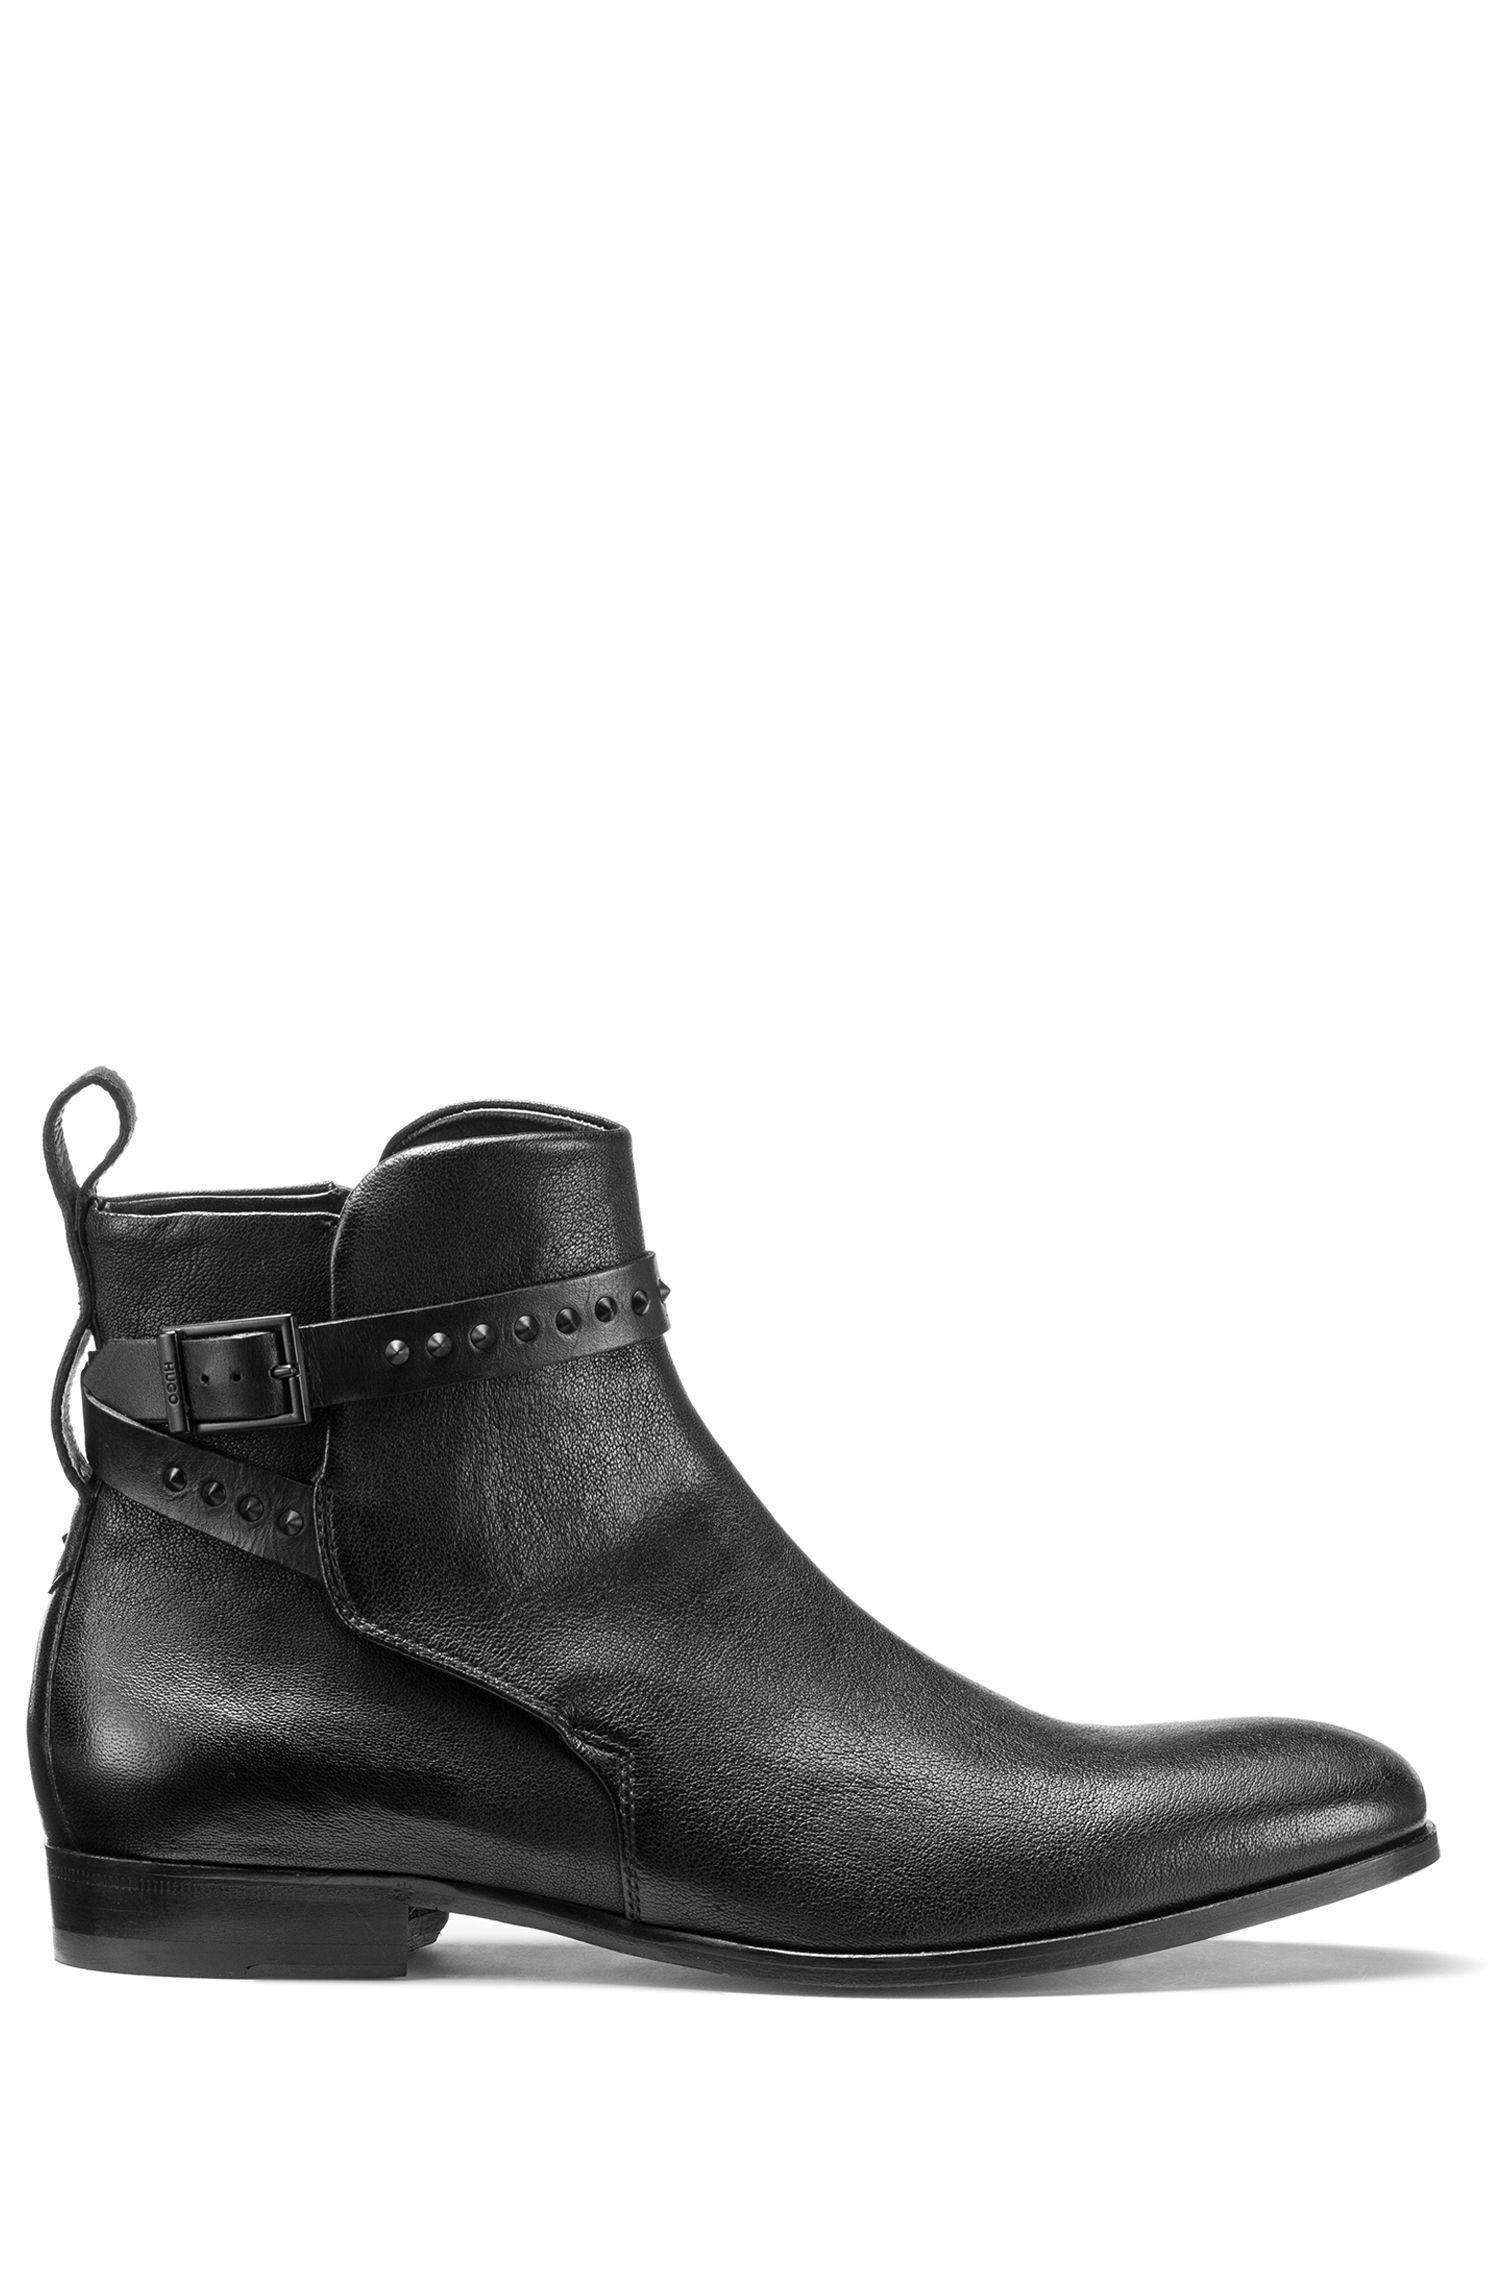 Chelsea Boots aus gewalktem Leder im Reiter-Look